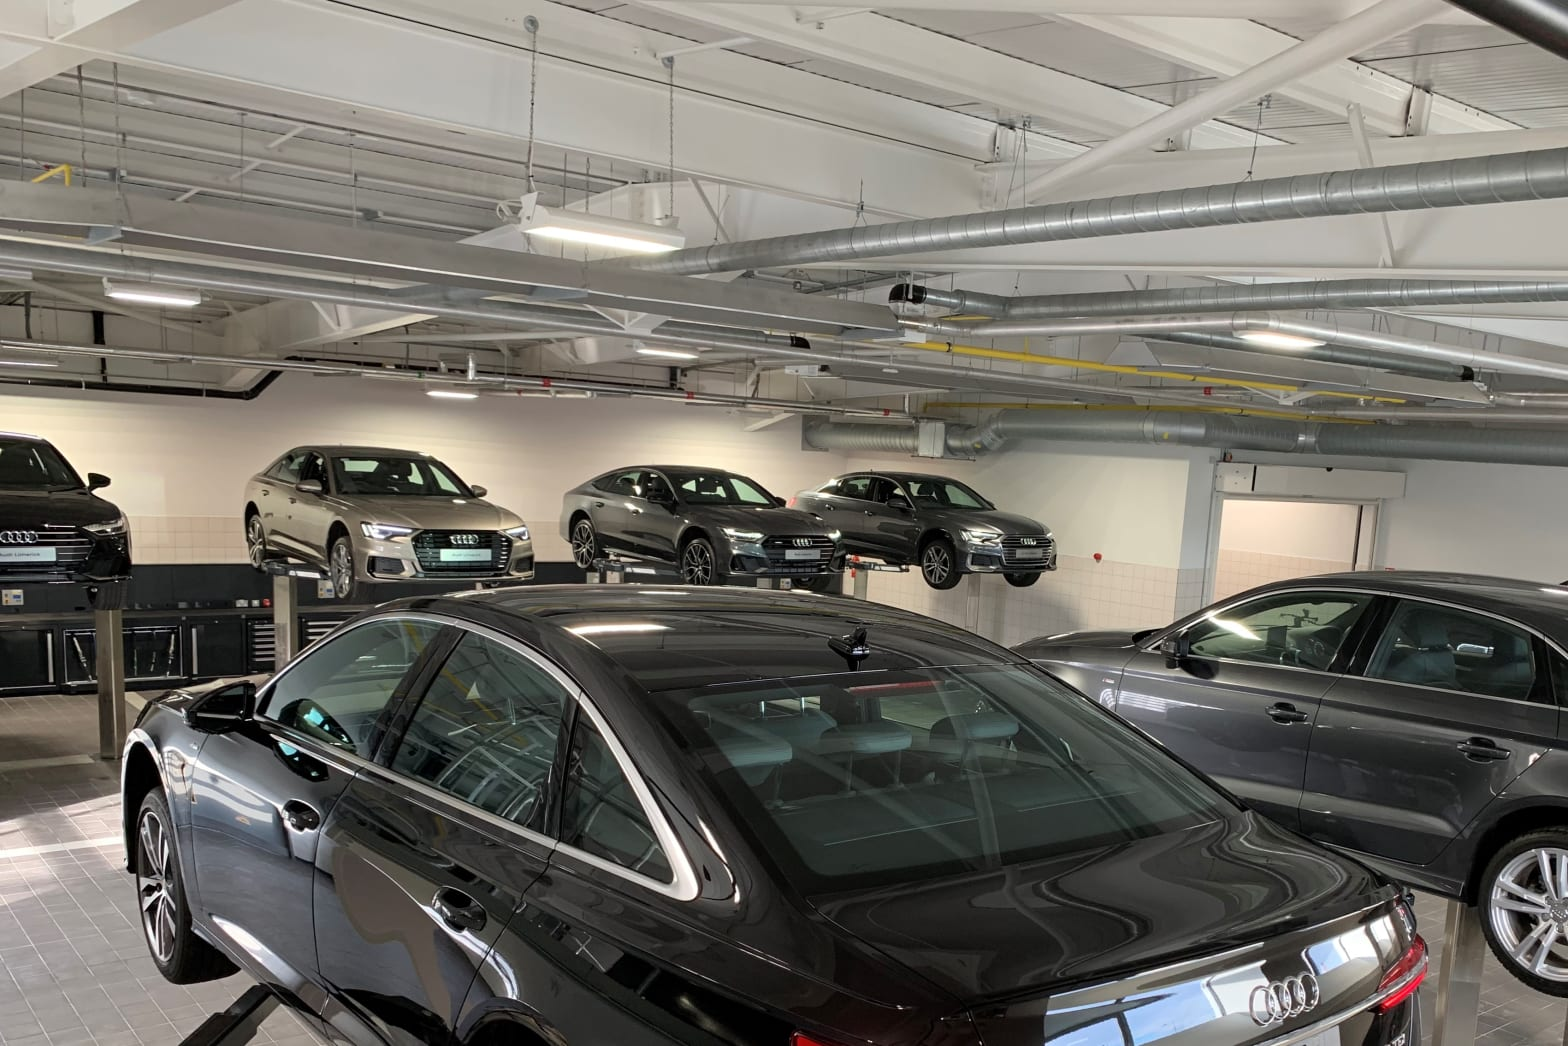 Apcoa Parking Ireland - Welcome